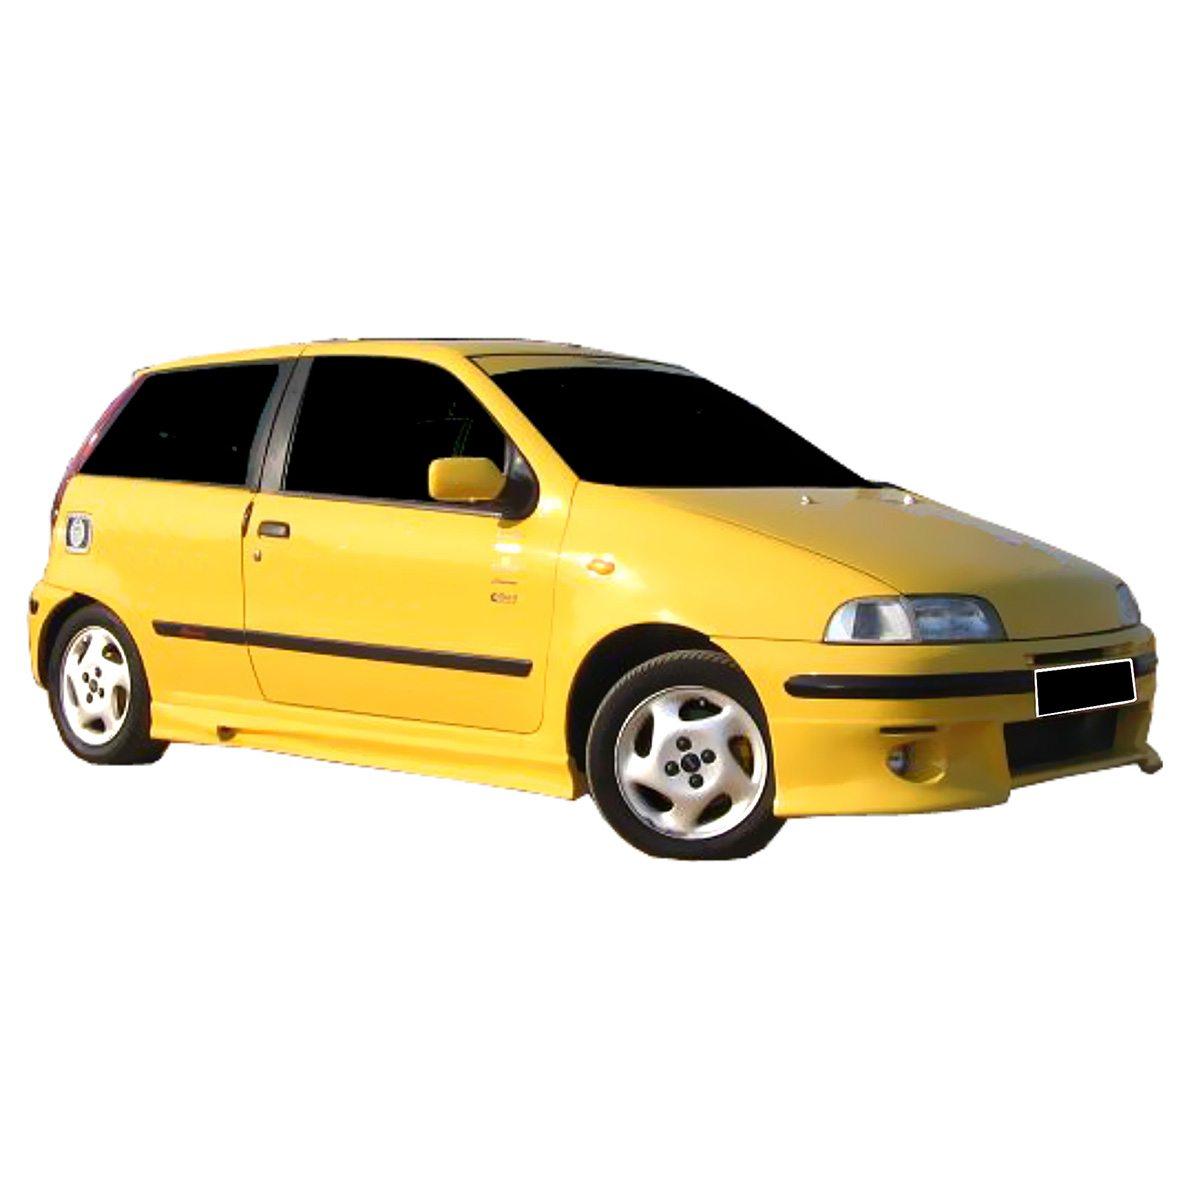 Fiat-Punto-I-3-5-Portas-Emb-EBU0032